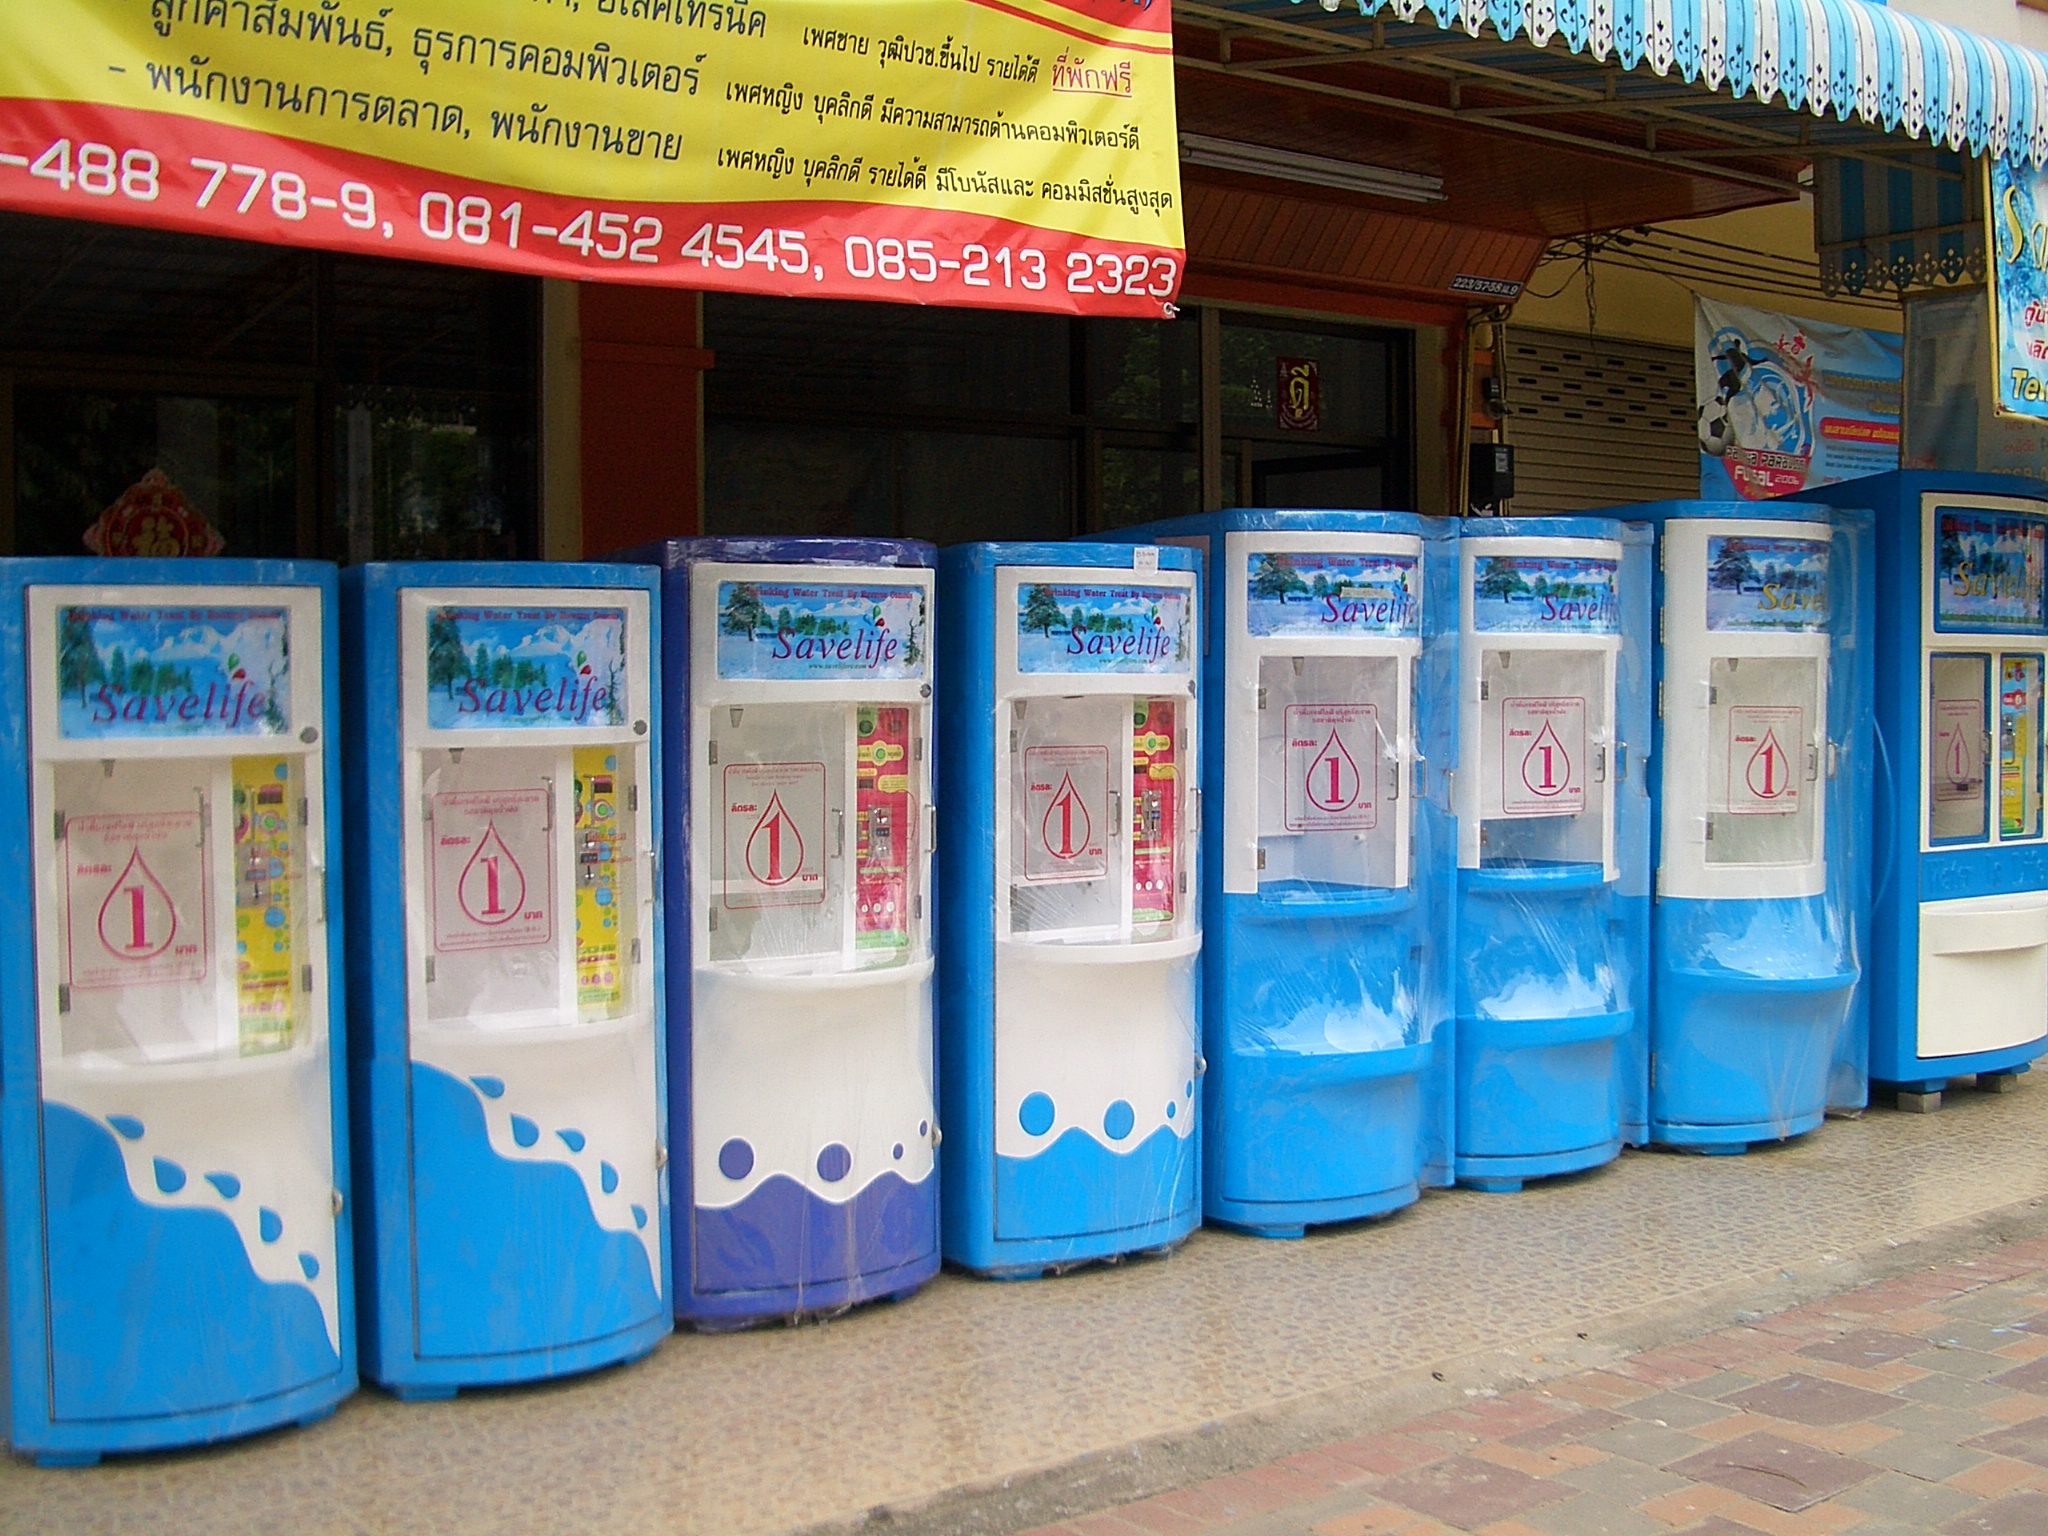 vending machine loans